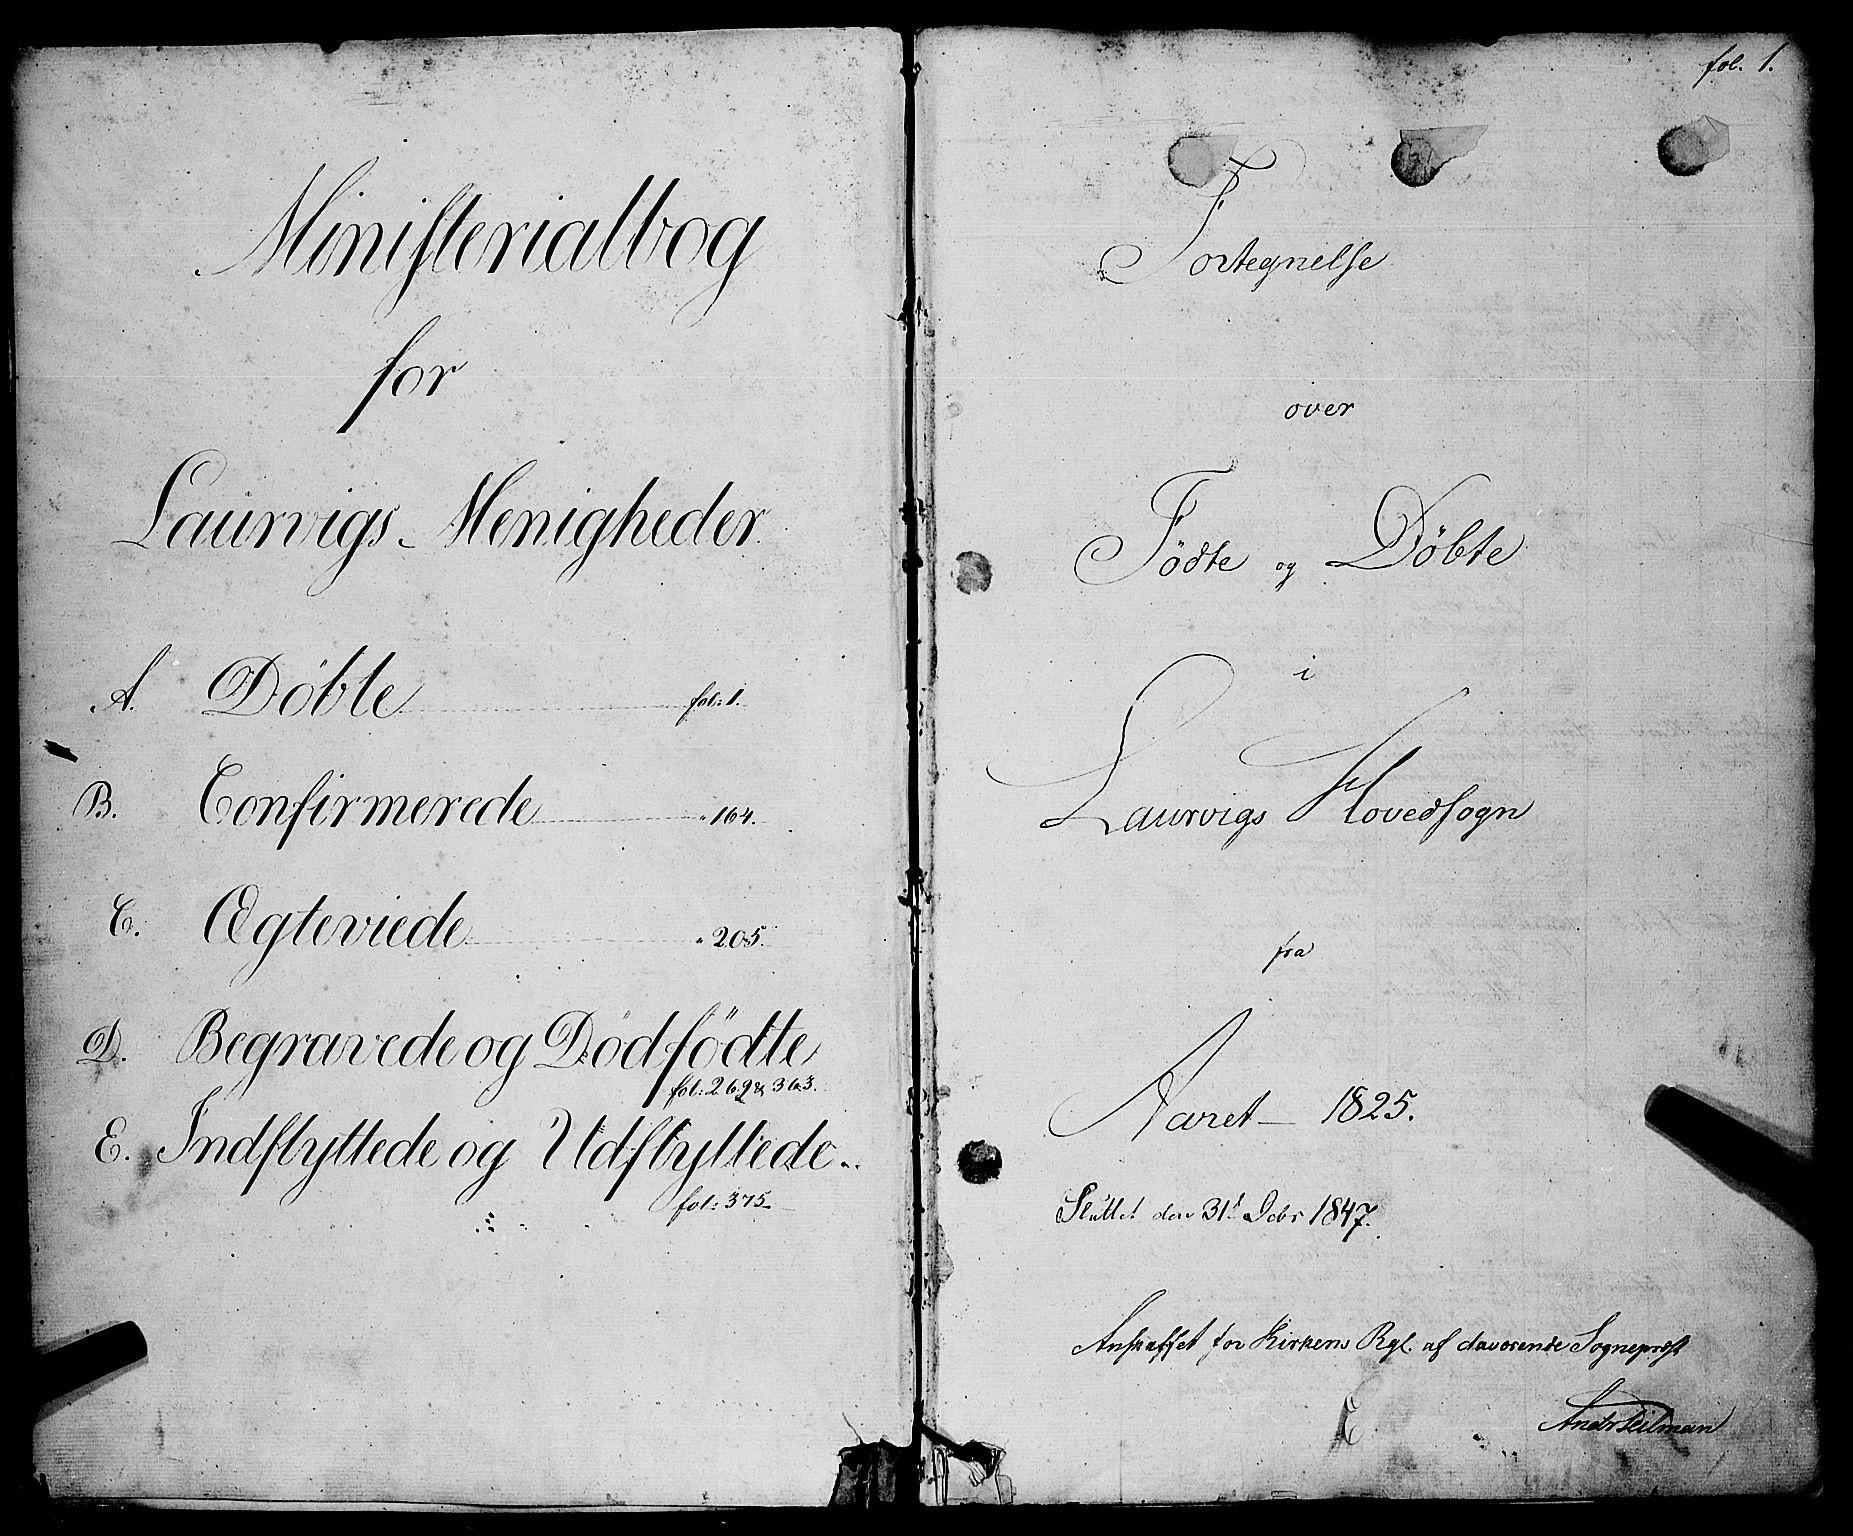 SAKO, Larvik kirkebøker, F/Fa/L0002: Ministerialbok nr. I 2, 1825-1847, s. 1